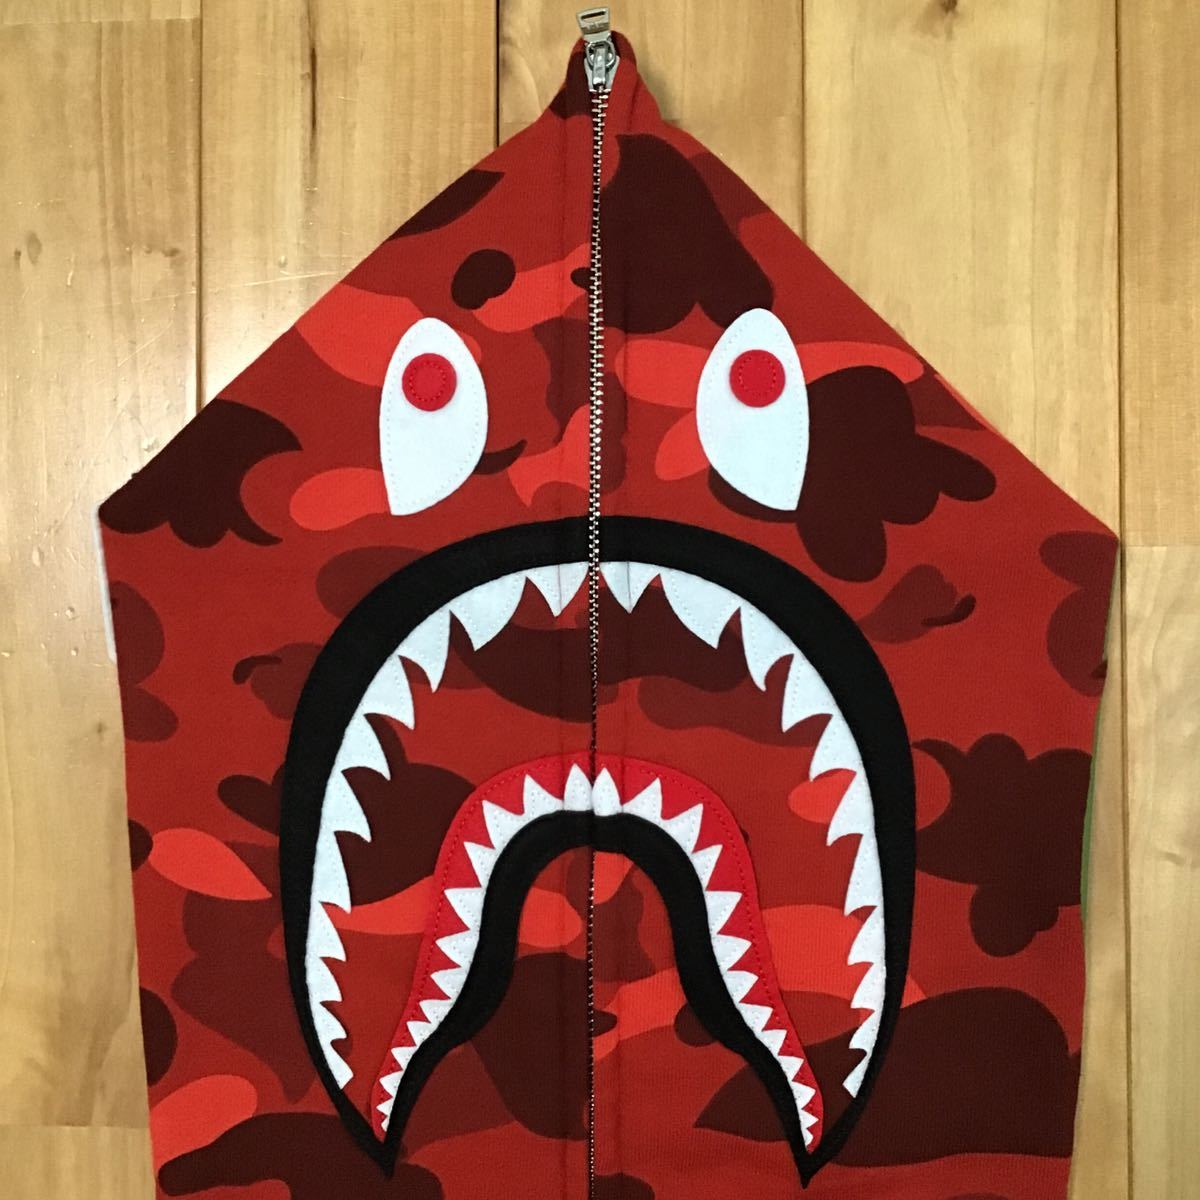 ★XL★ Red camo シャーク パーカー shark full zip hoodie a bathing ape bape エイプ ベイプ アベイシングエイプ 迷彩 85ma